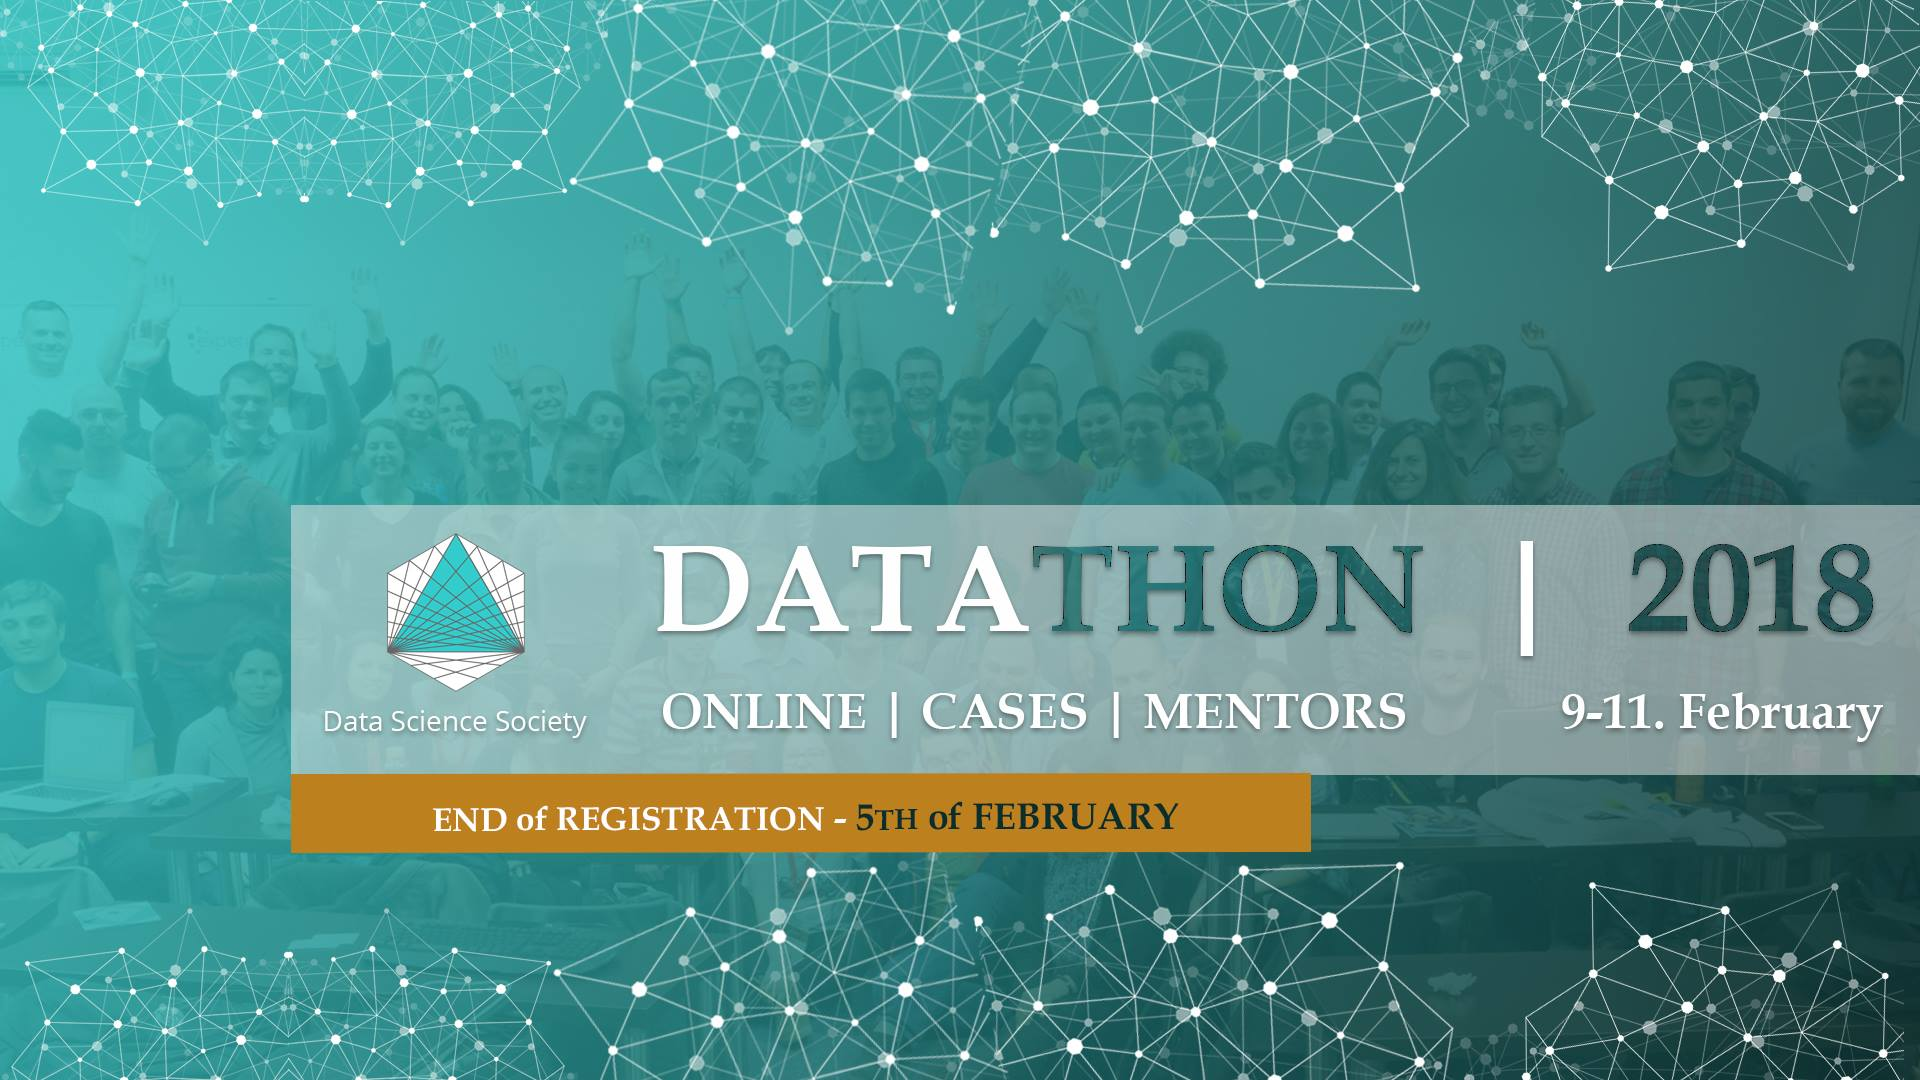 #Datathon2018